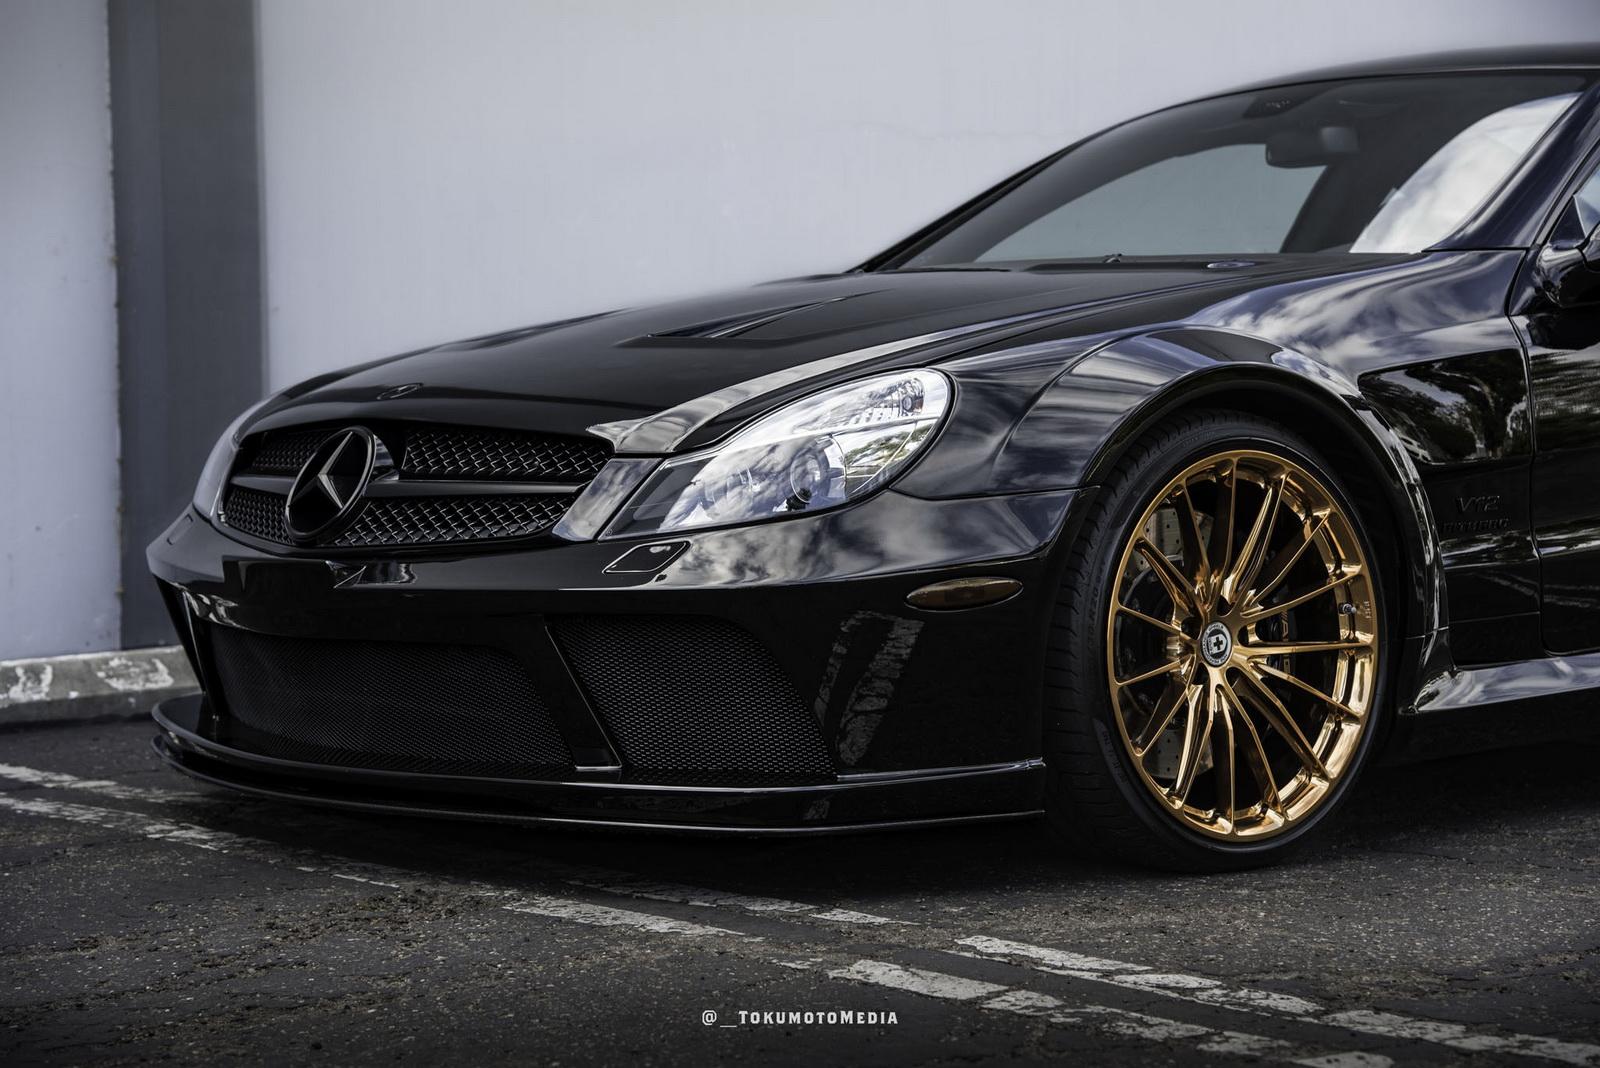 Black Amg Mercedes Benz Sl65 Series